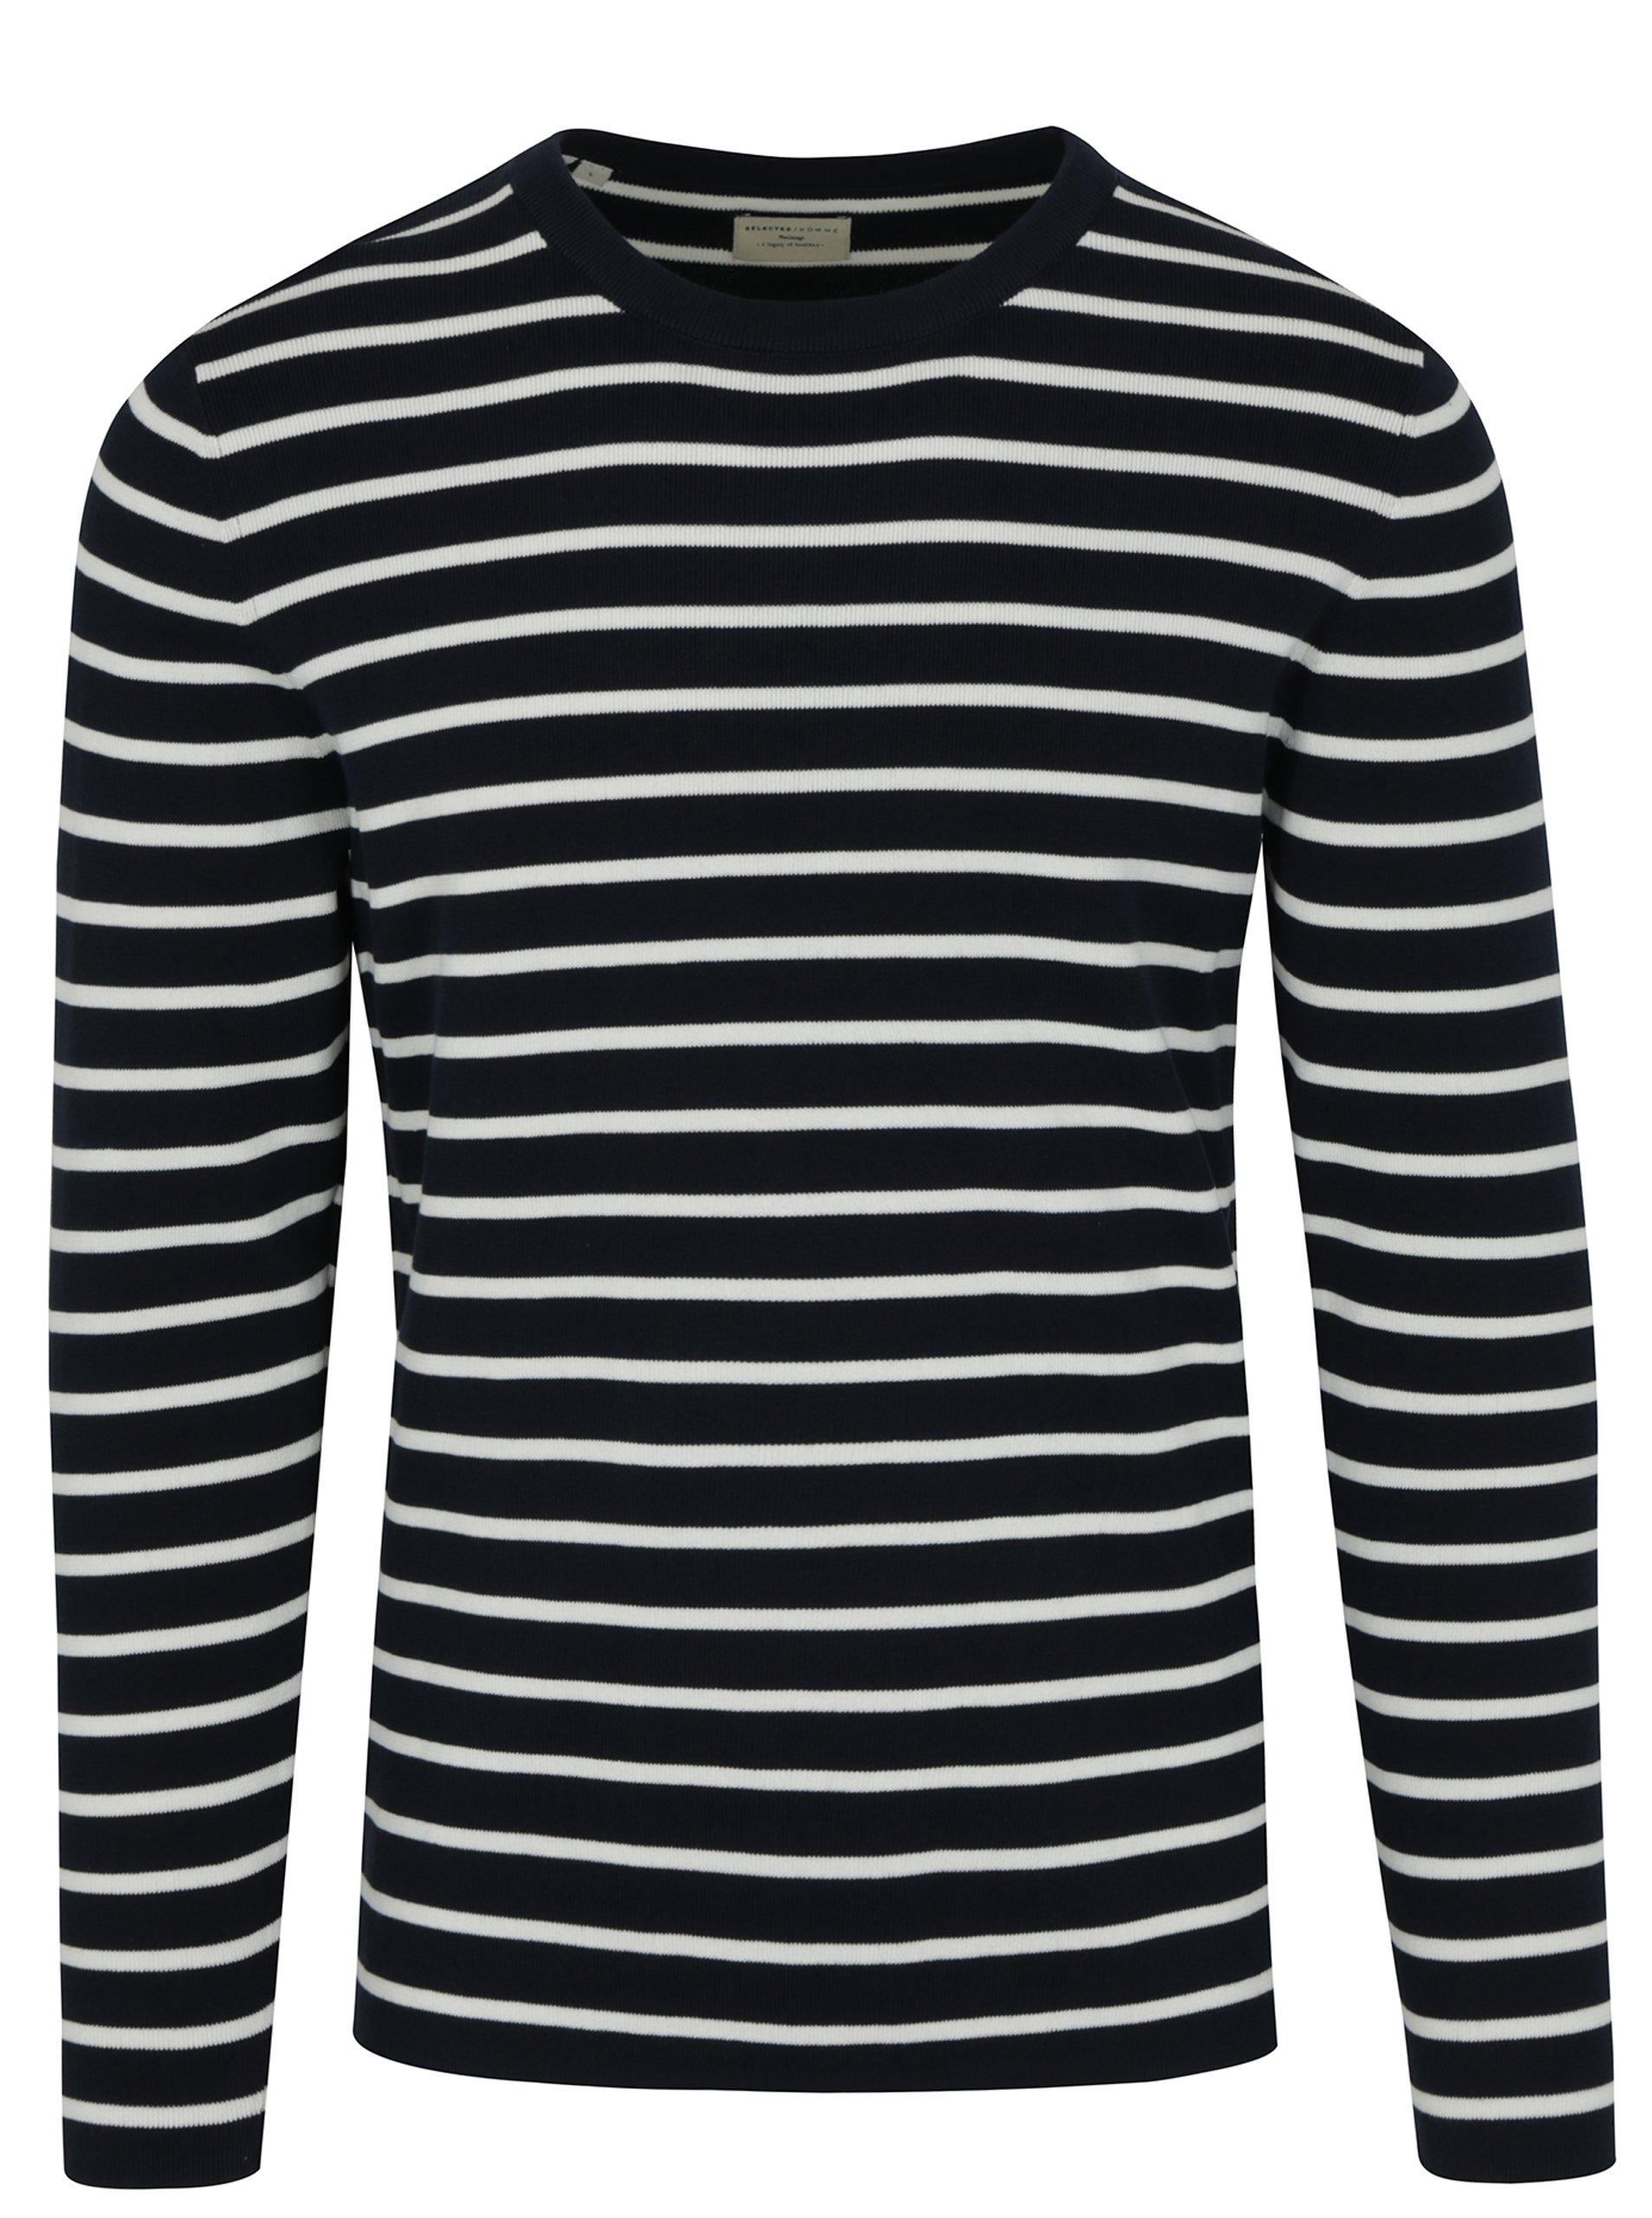 238feb1f45 Tmavomodrý pruhovaný sveter Selected Homme Sailor - Glami.sk